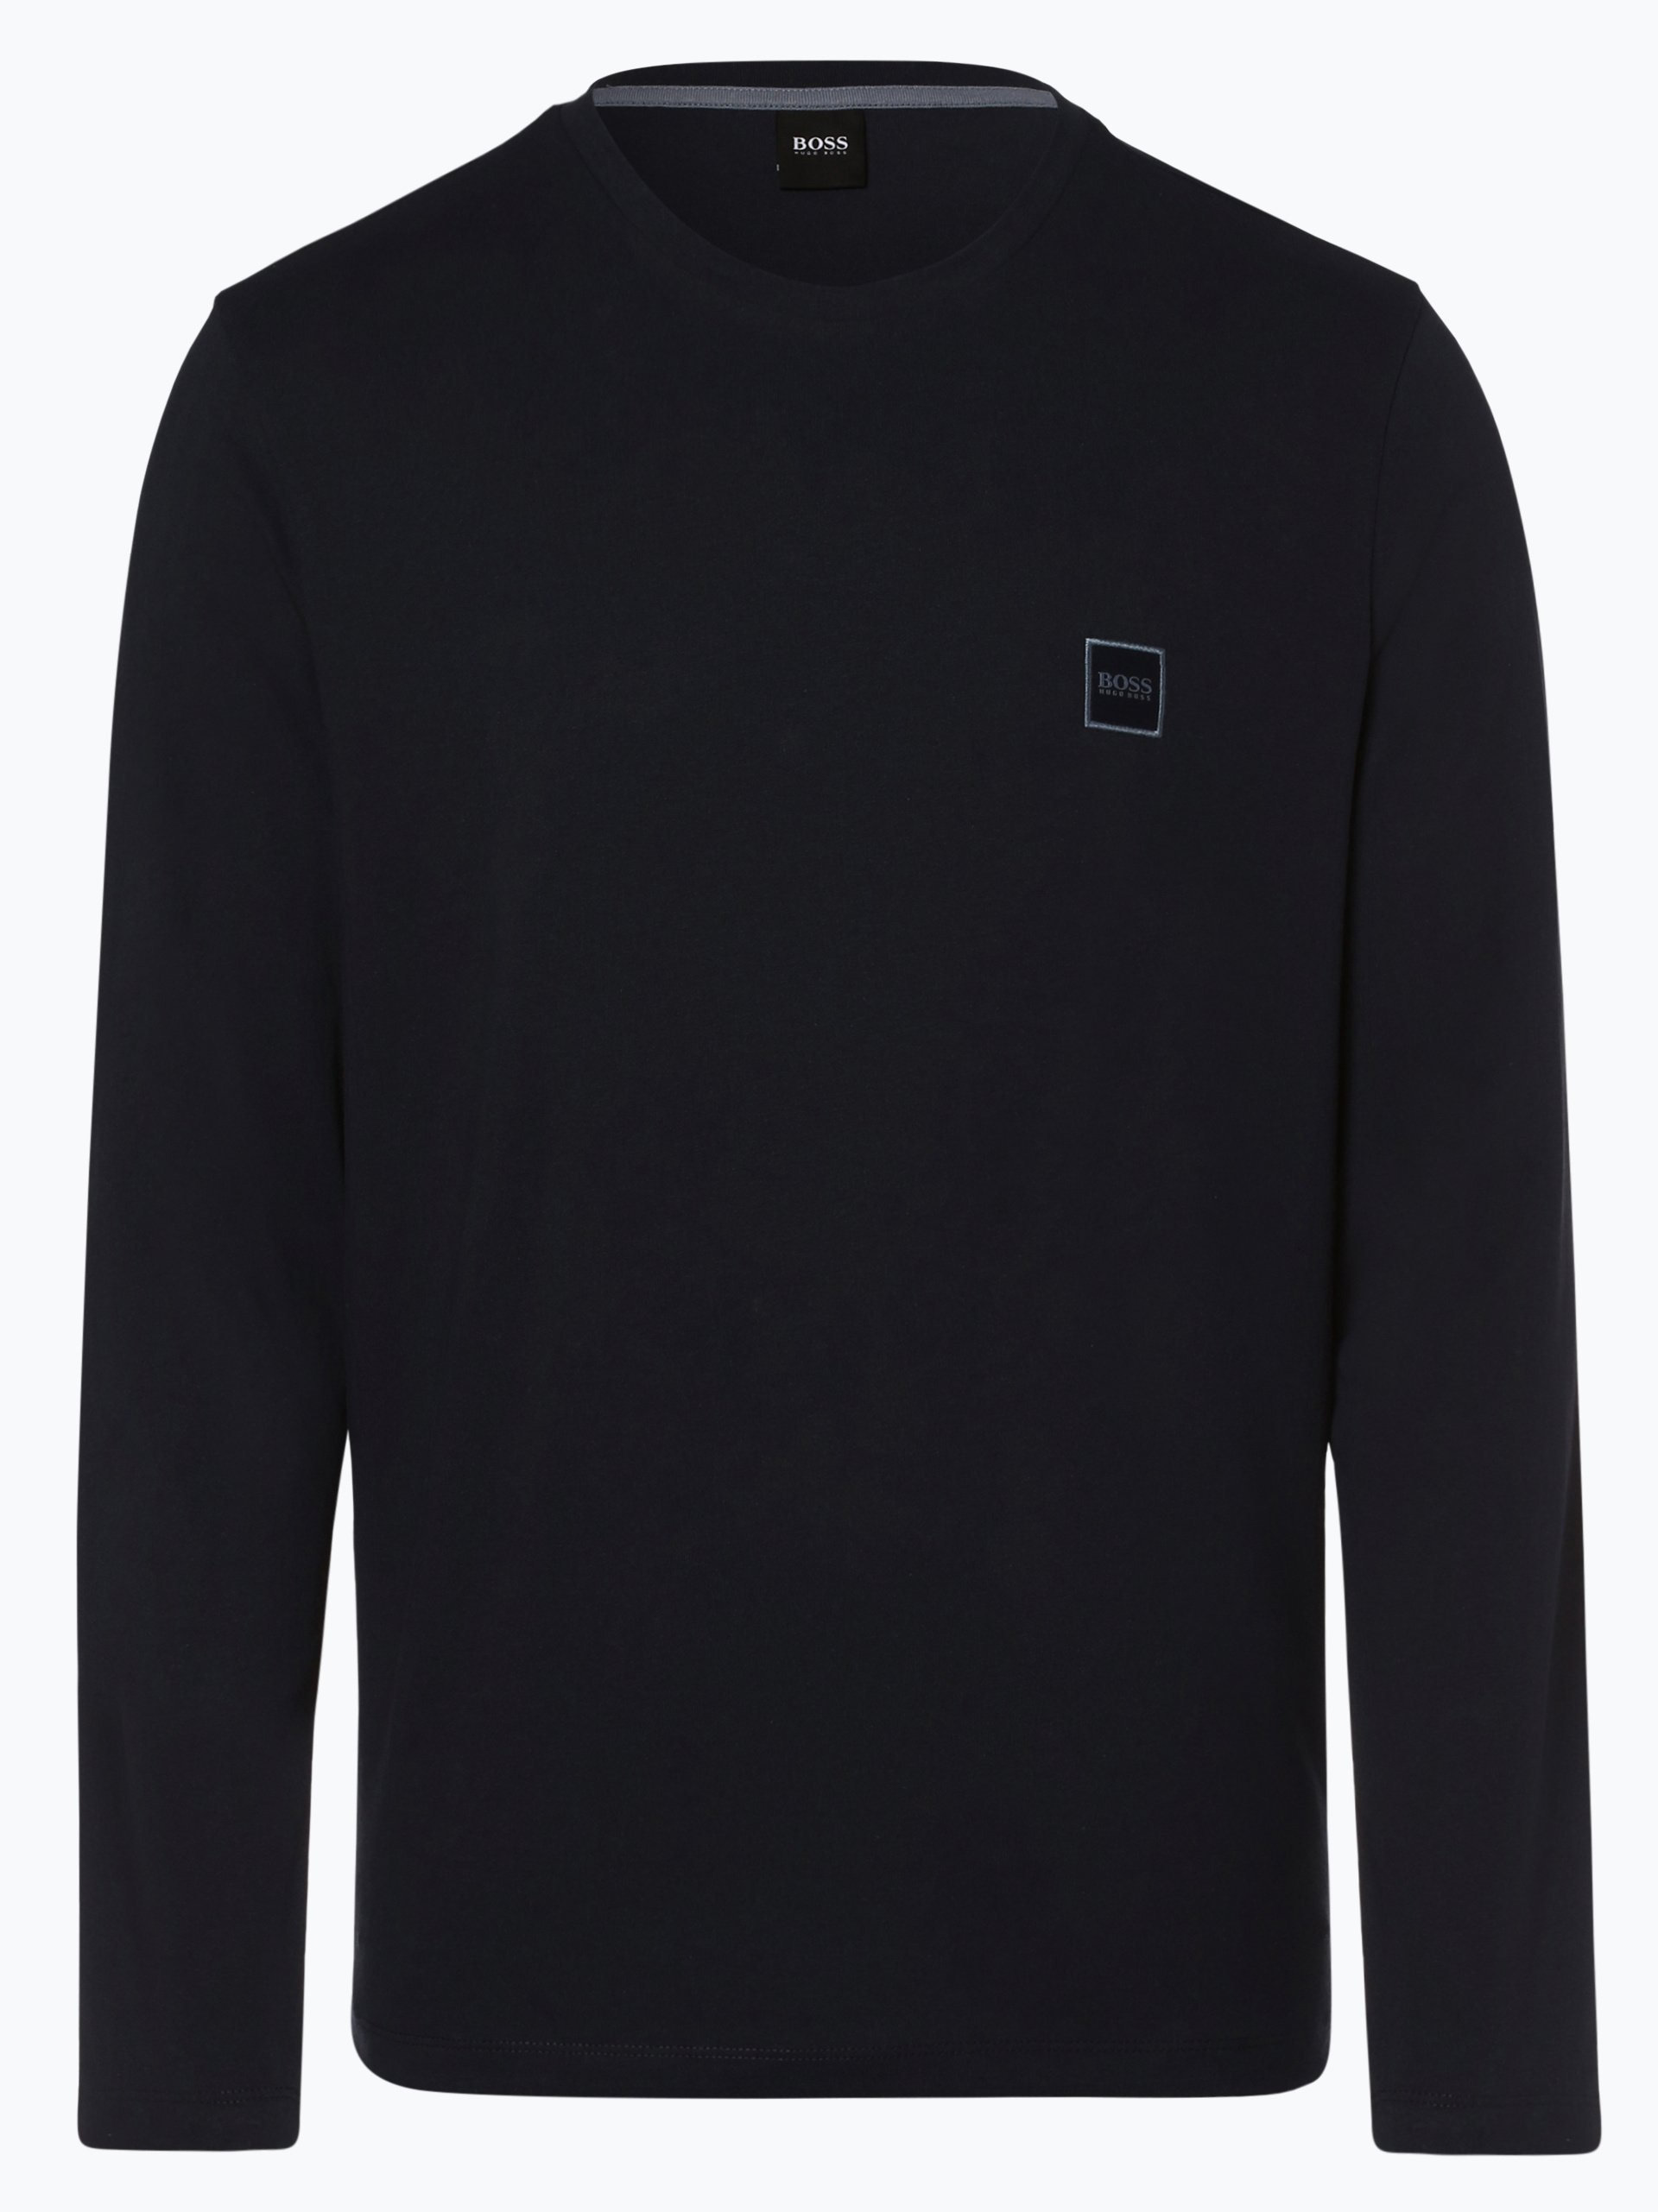 BOSS Casual Męska koszulka z długim rękawem – Tacks